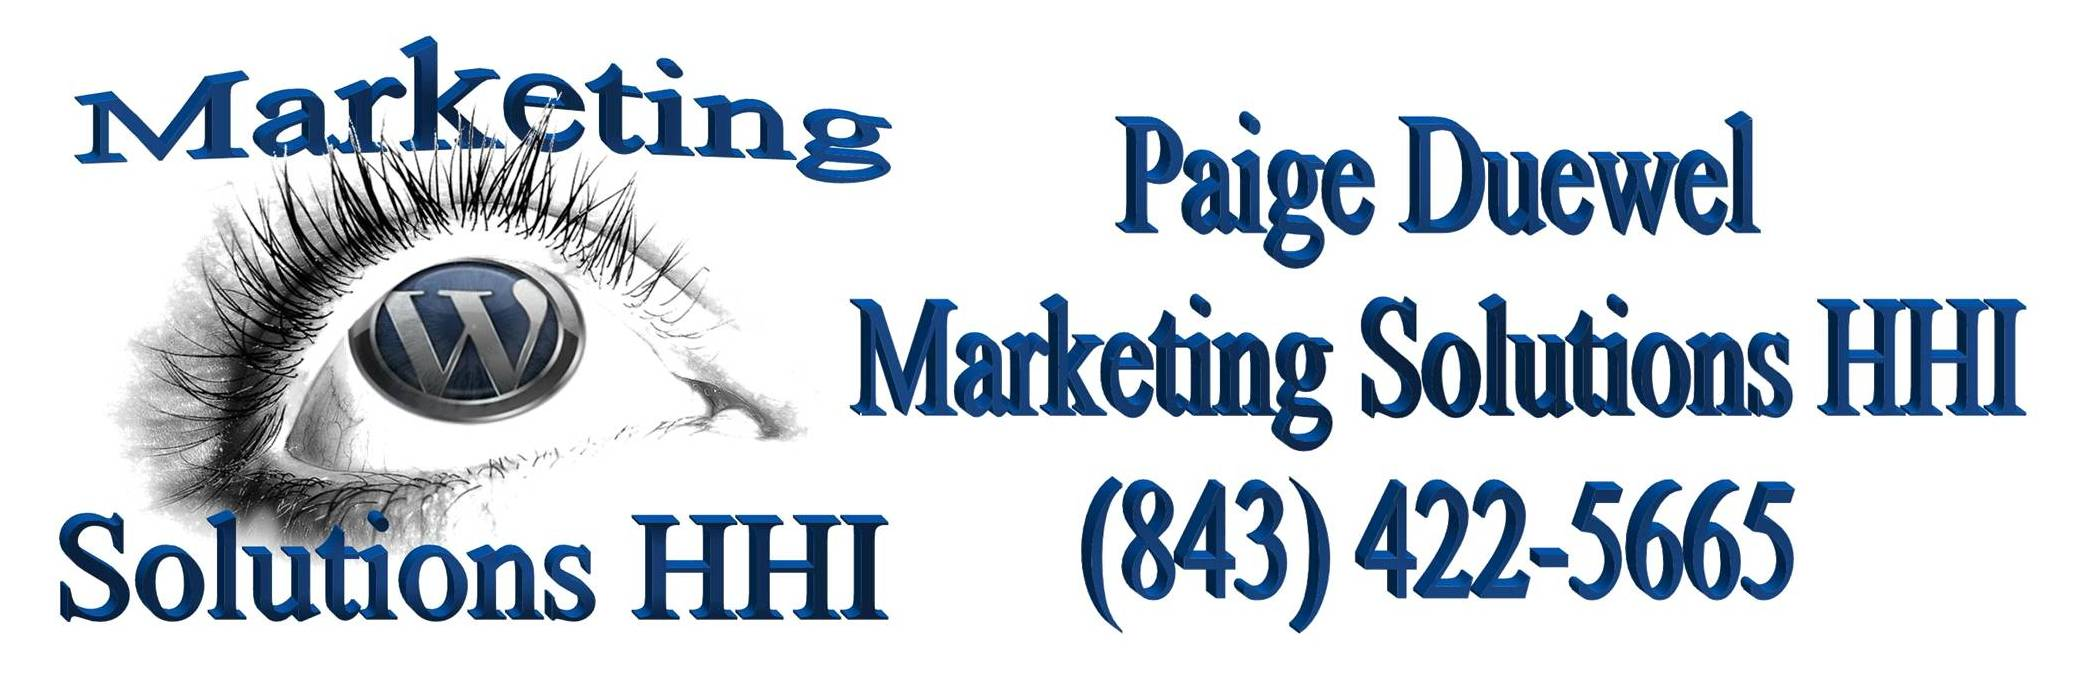 Website Design, SEO, Internet Marketing